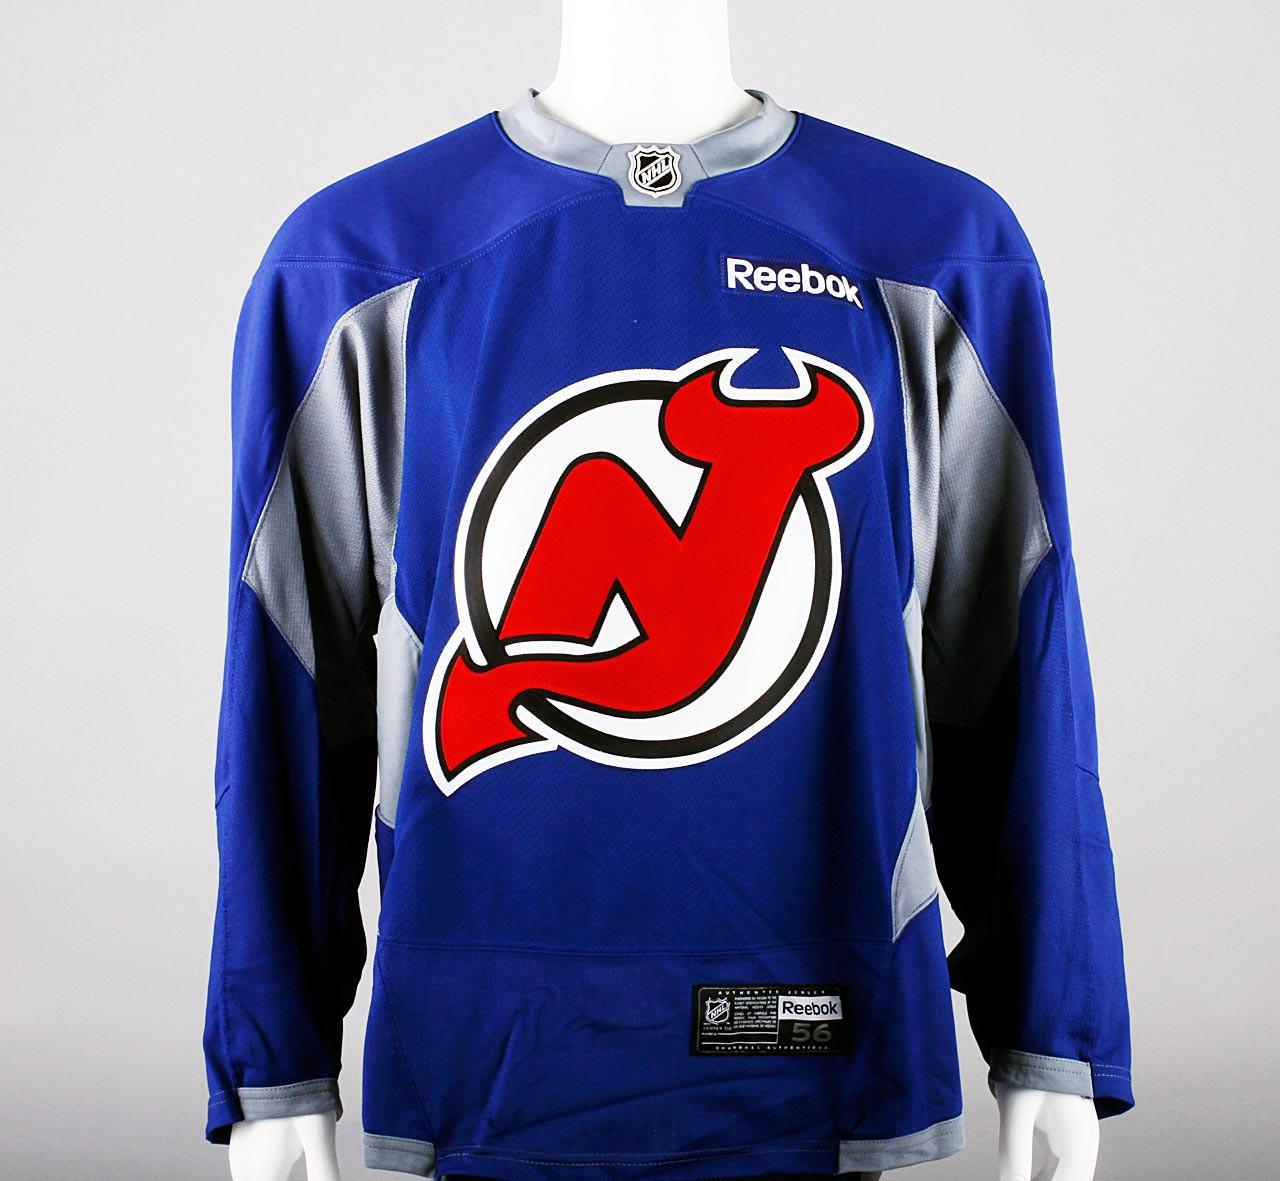 premium selection c160d e3c88 Practice Jersey - New Jersey Devils - Royal Blue Reebok Size 56 #3